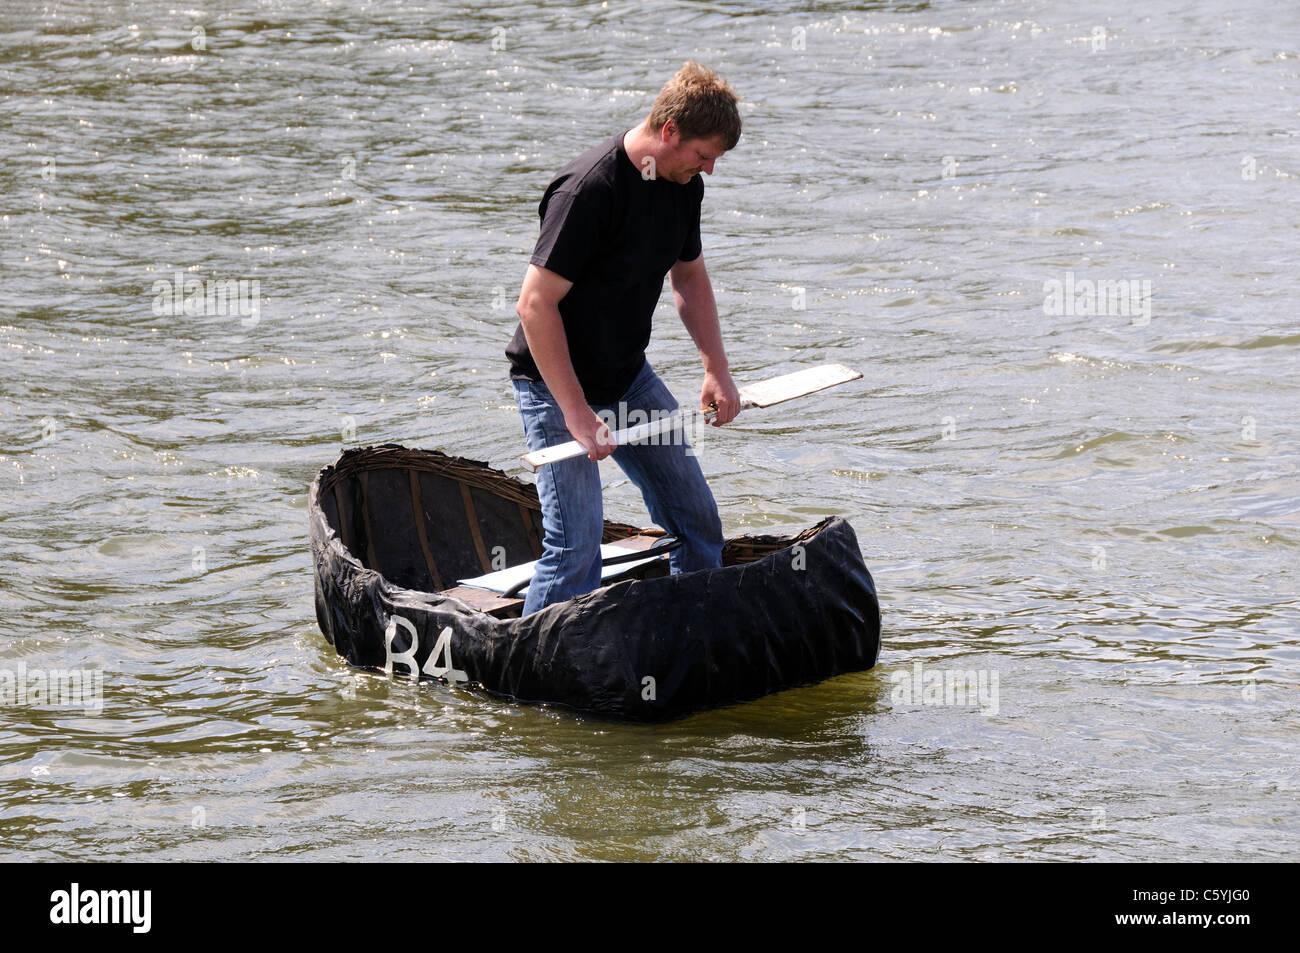 Traitional Coracle Fischer am Fluss Teifi Cardigan Ceredigion Wales km UK GB Stockbild